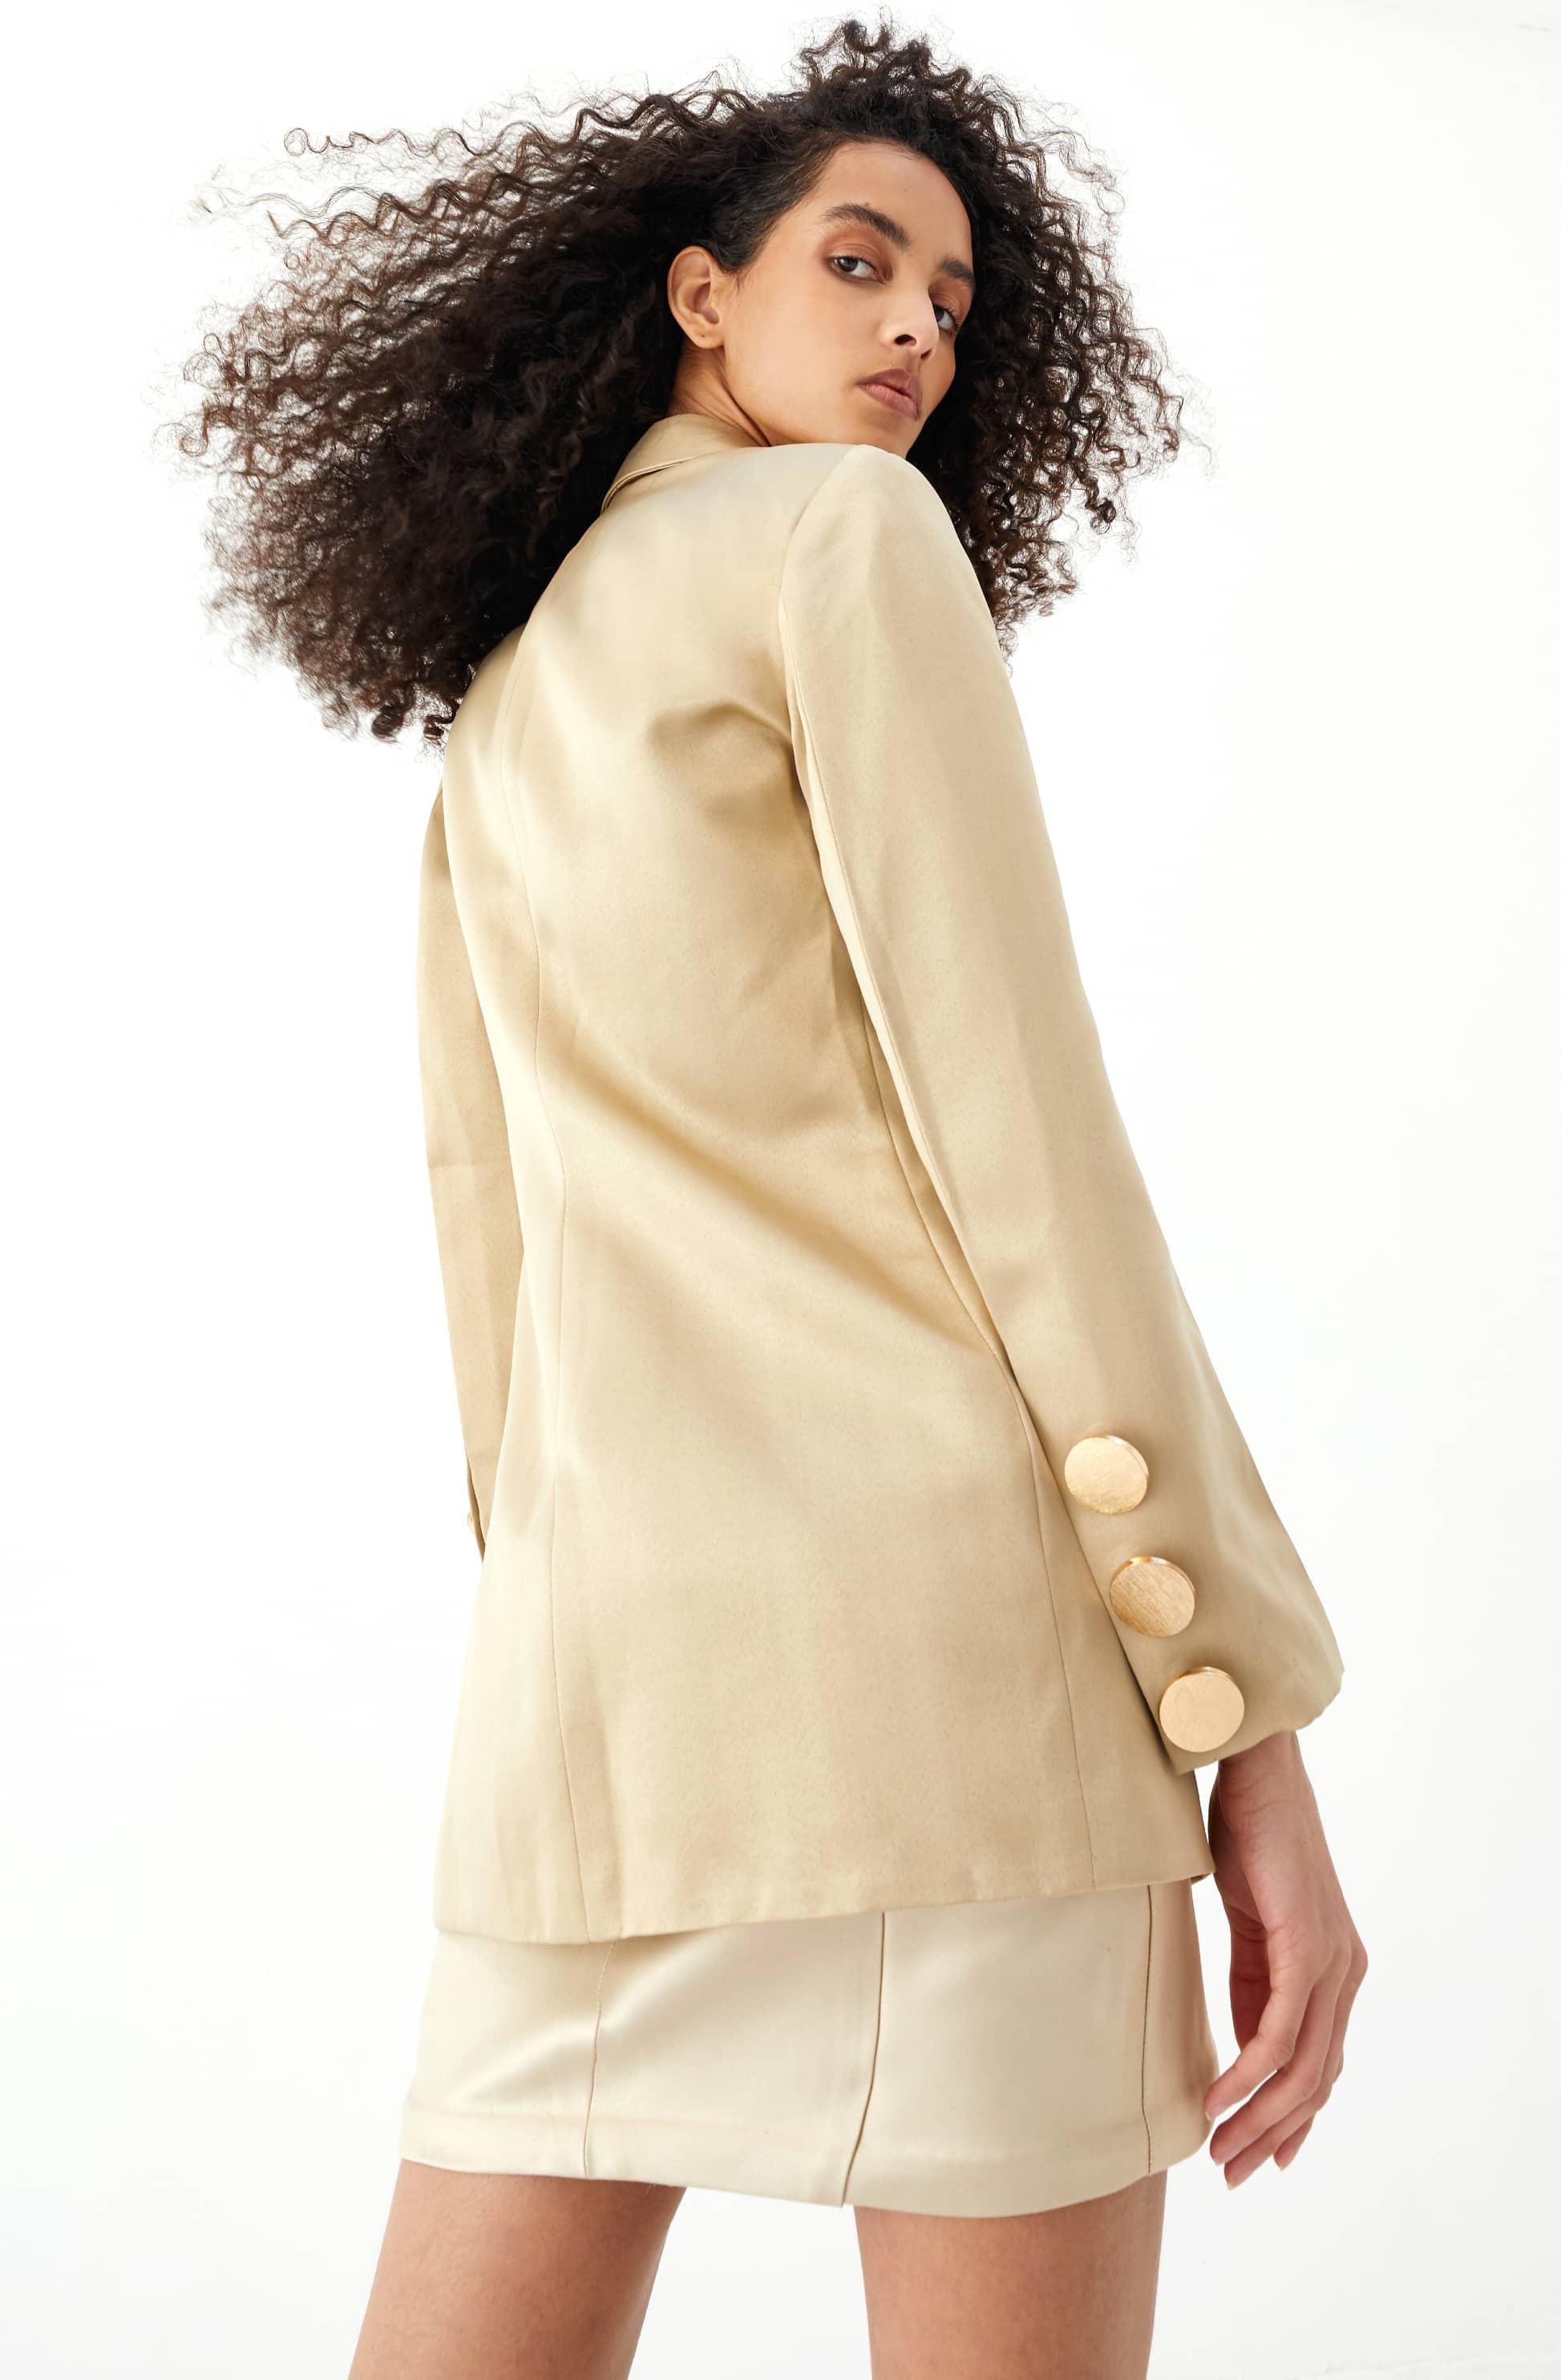 View 5 of model wearing Kalisa Blazer in sand gold.